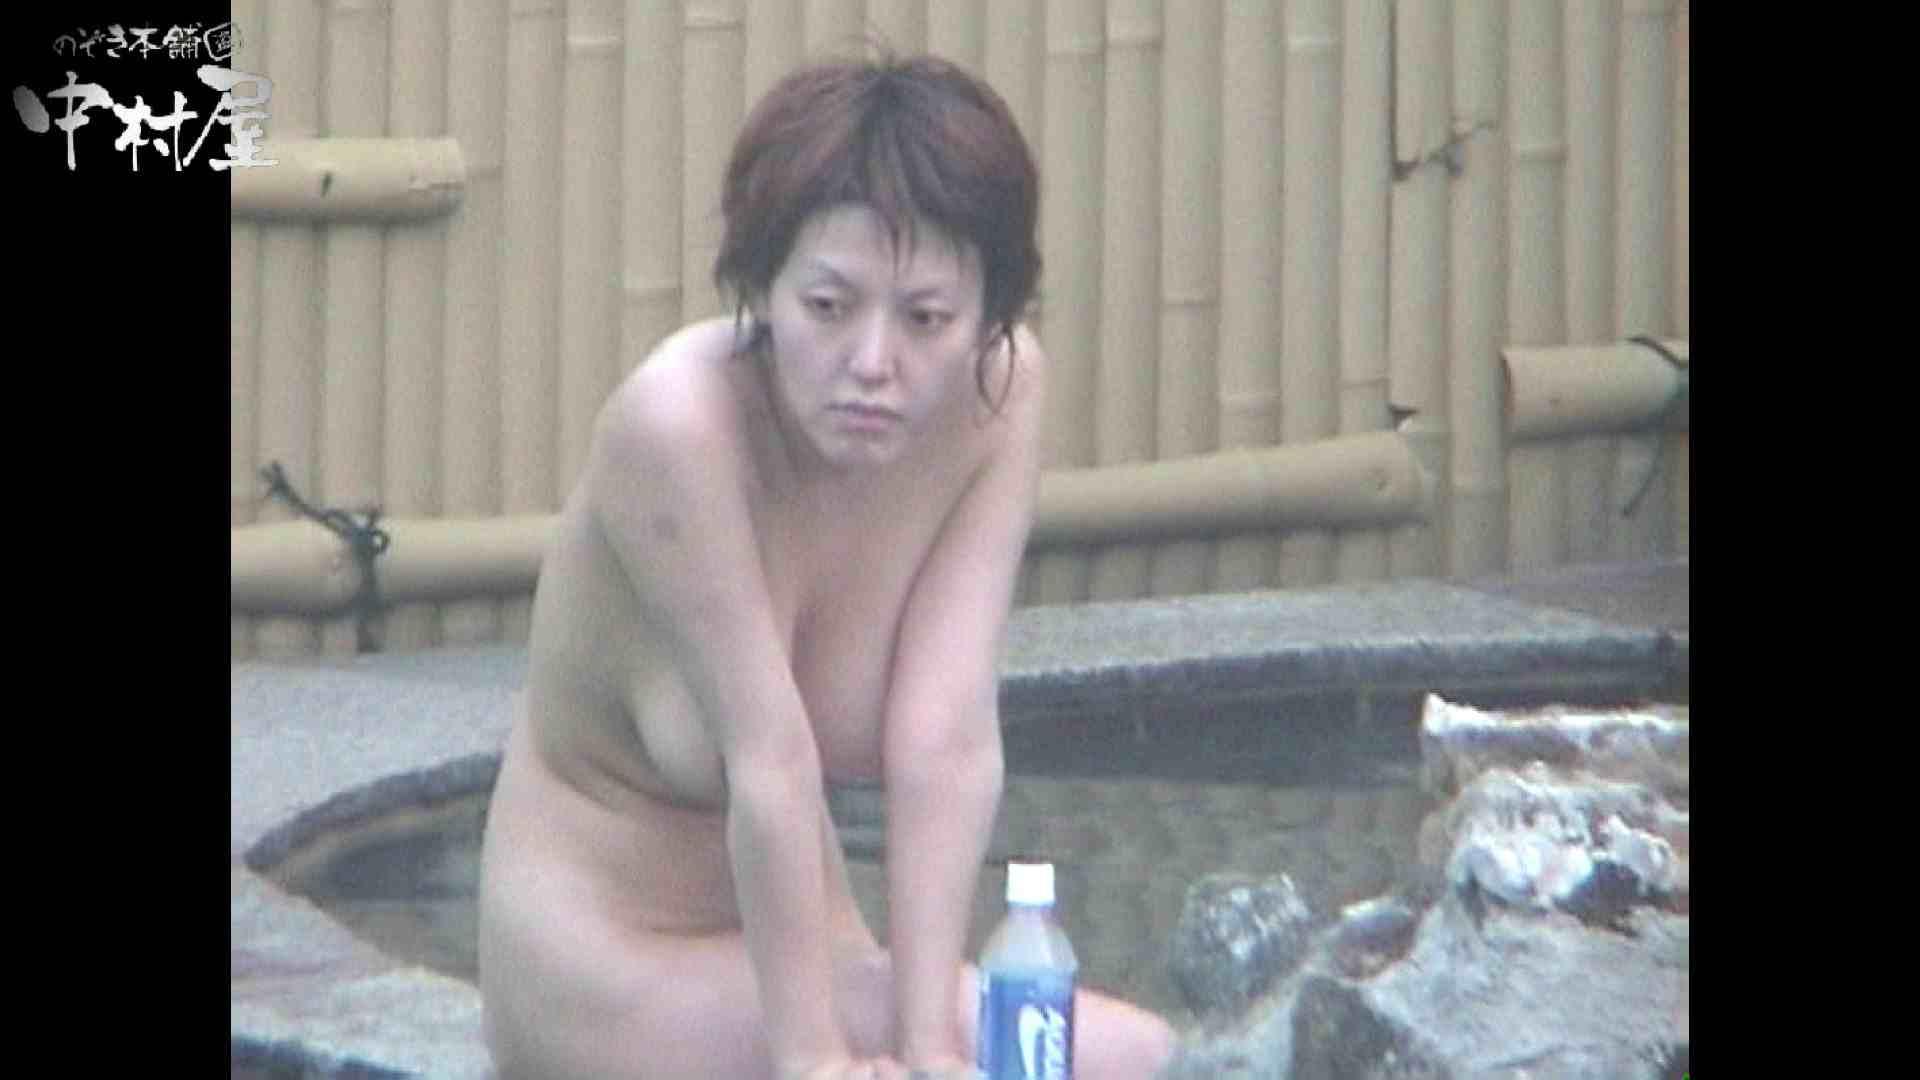 Aquaな露天風呂Vol.959 盗撮シリーズ | 露天風呂編  80PIX 63